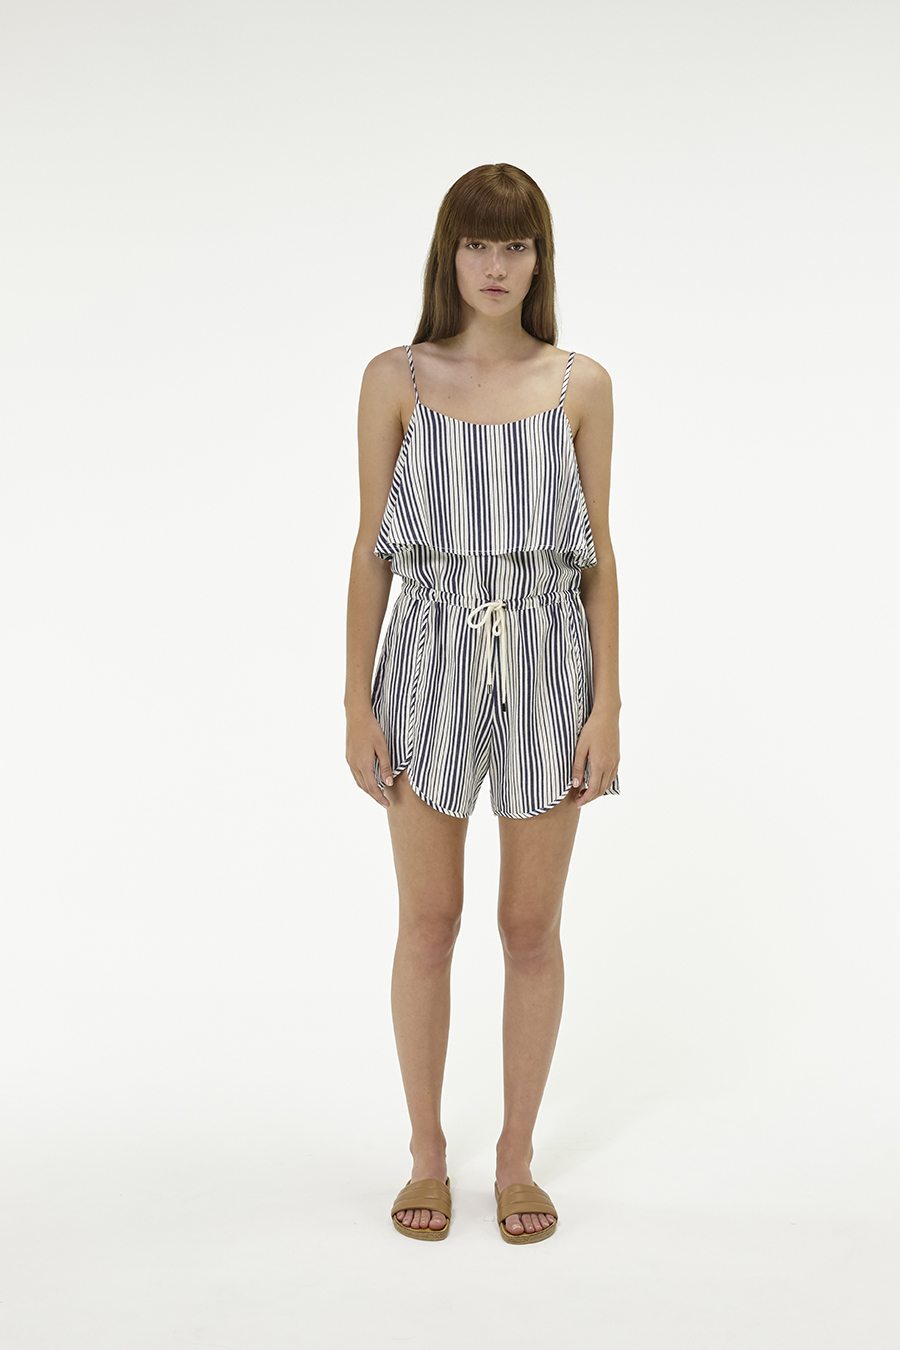 Huffer_Q3-16_W-Petal-Frill-Jumpsuit_Navy-Cream-01